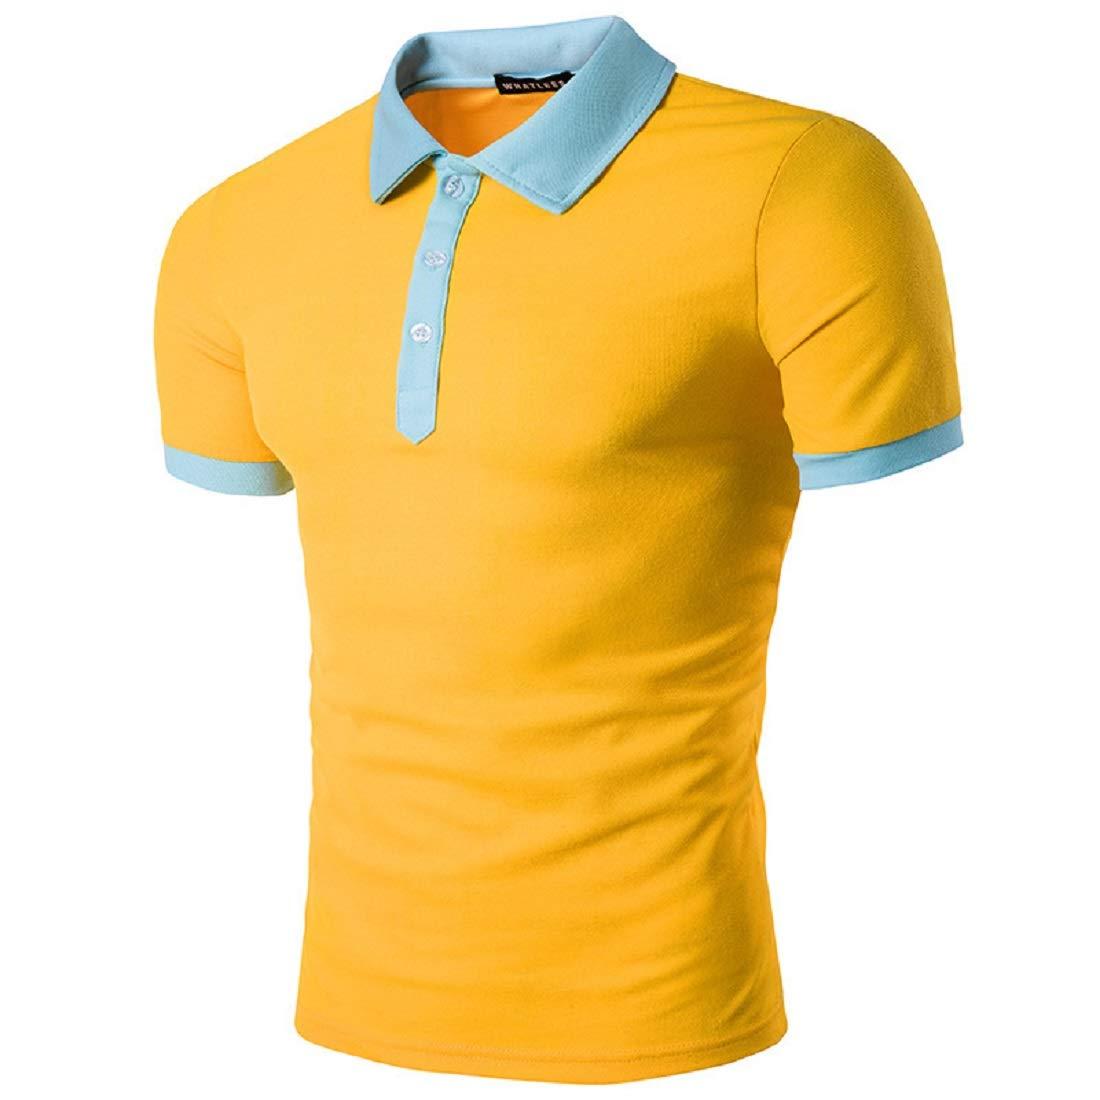 Camisetas Hombre, Moda Botón T-Shirt Polo Manga Corta Fitness ...